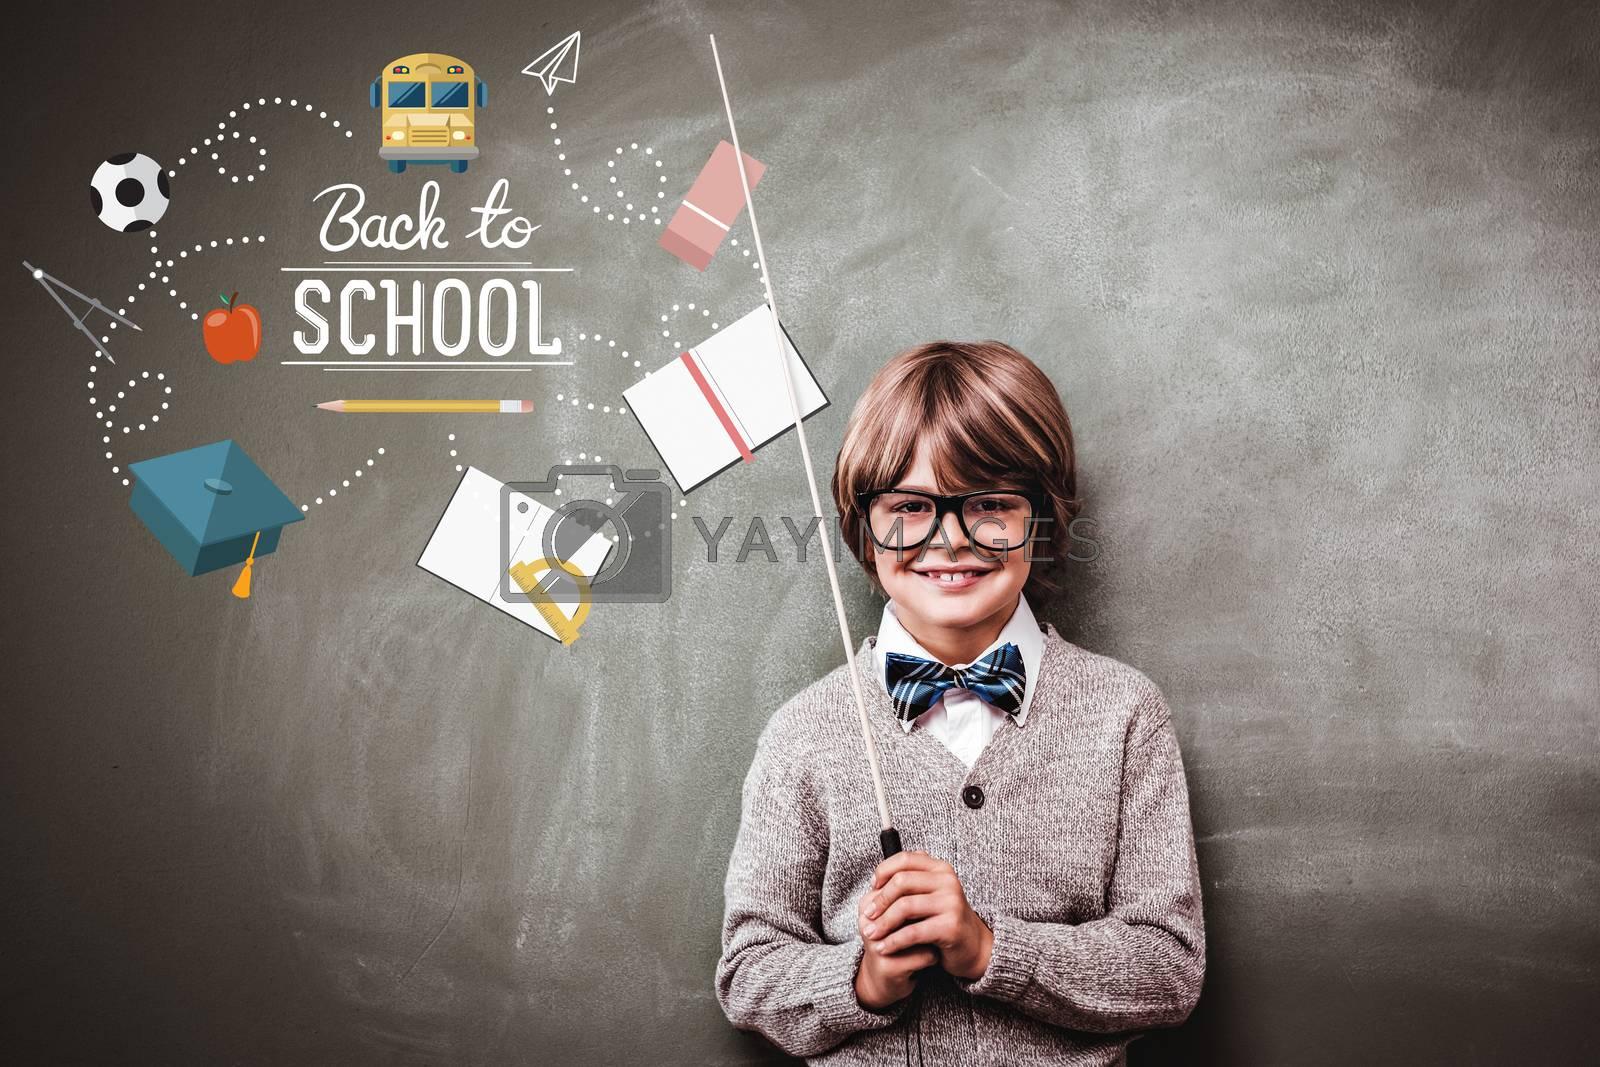 back to school against portrait of cute little boy holding stick